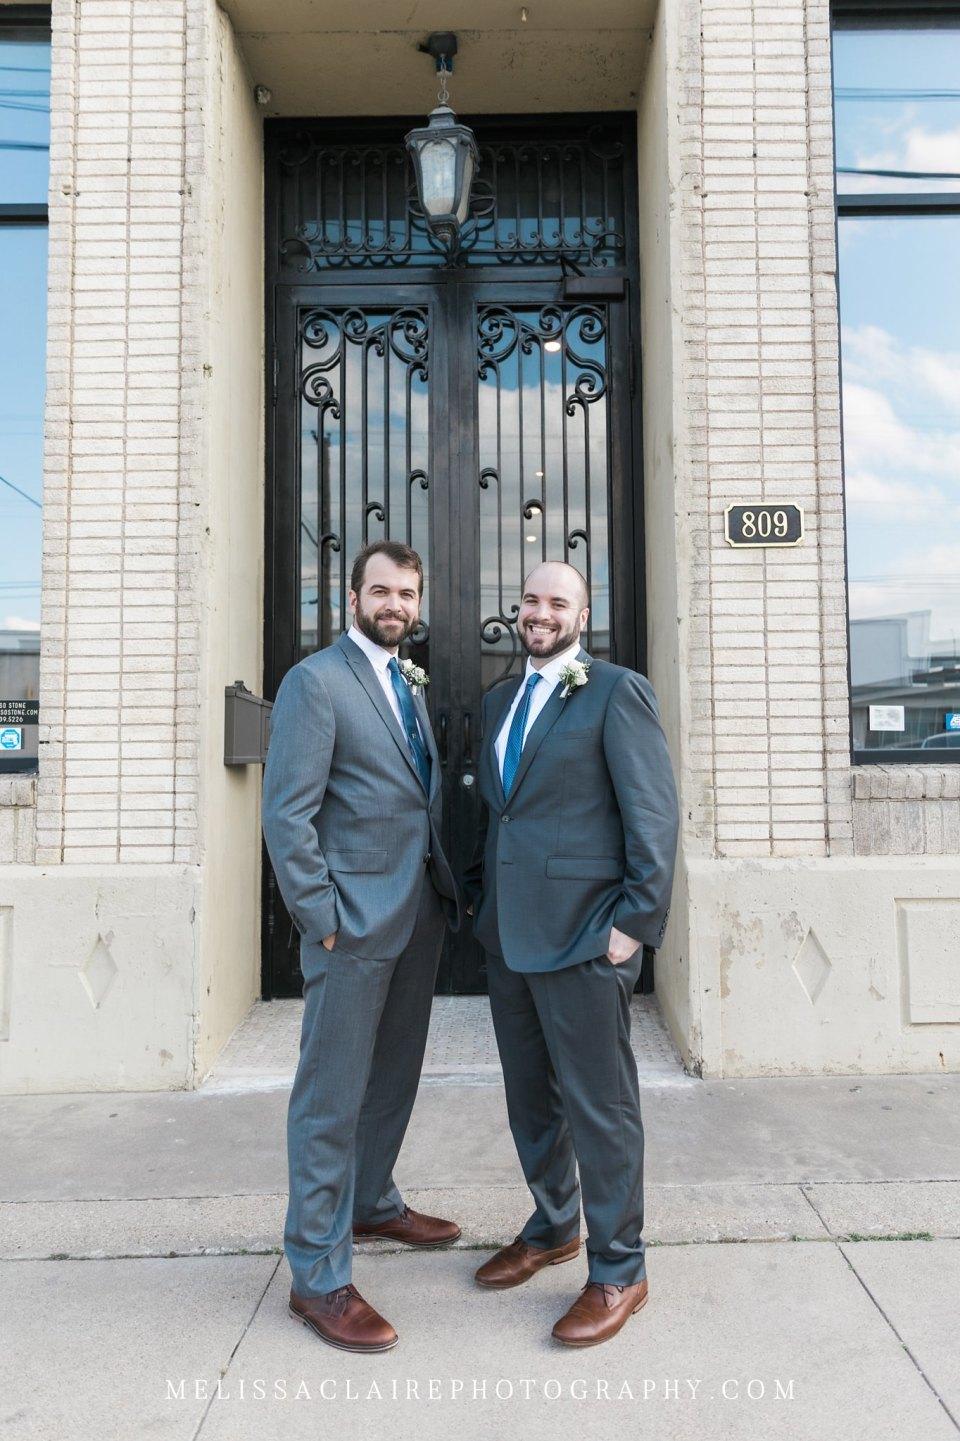 809_at_vickery_wedding_0006